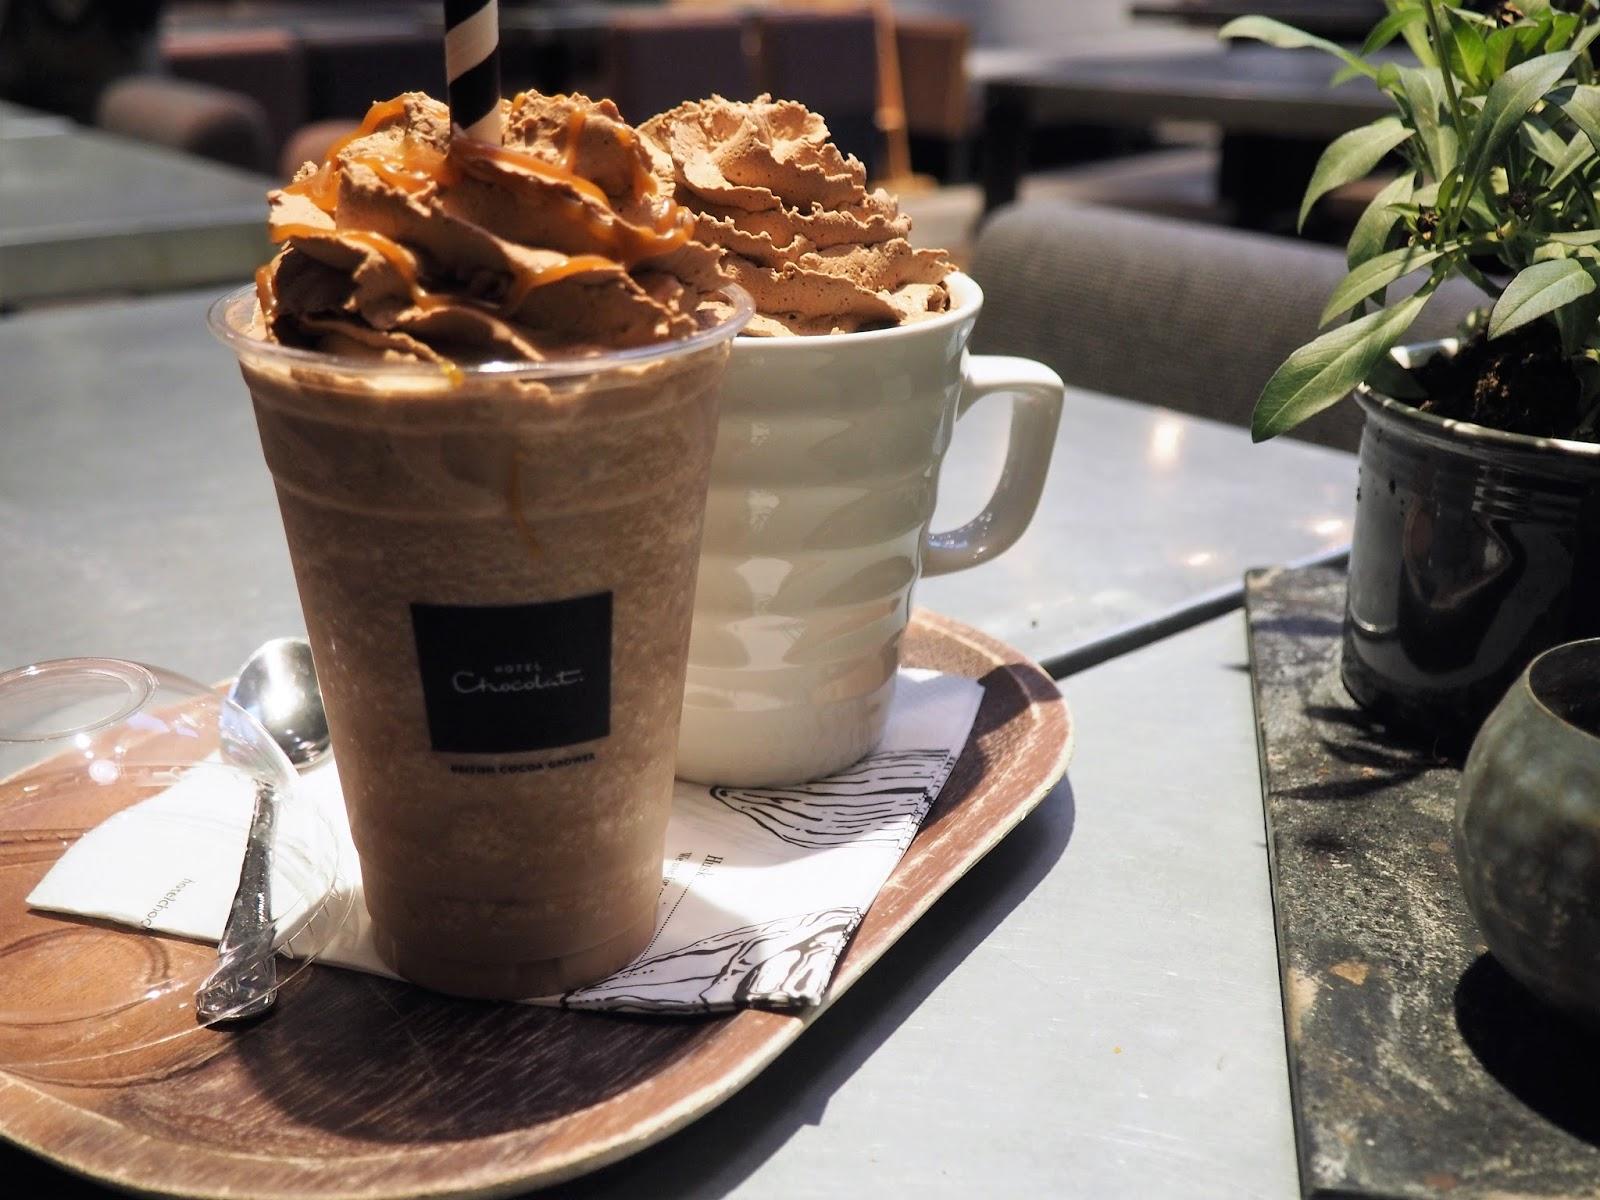 Drink at the Hotel Chocolat Cafe, Copenhagen